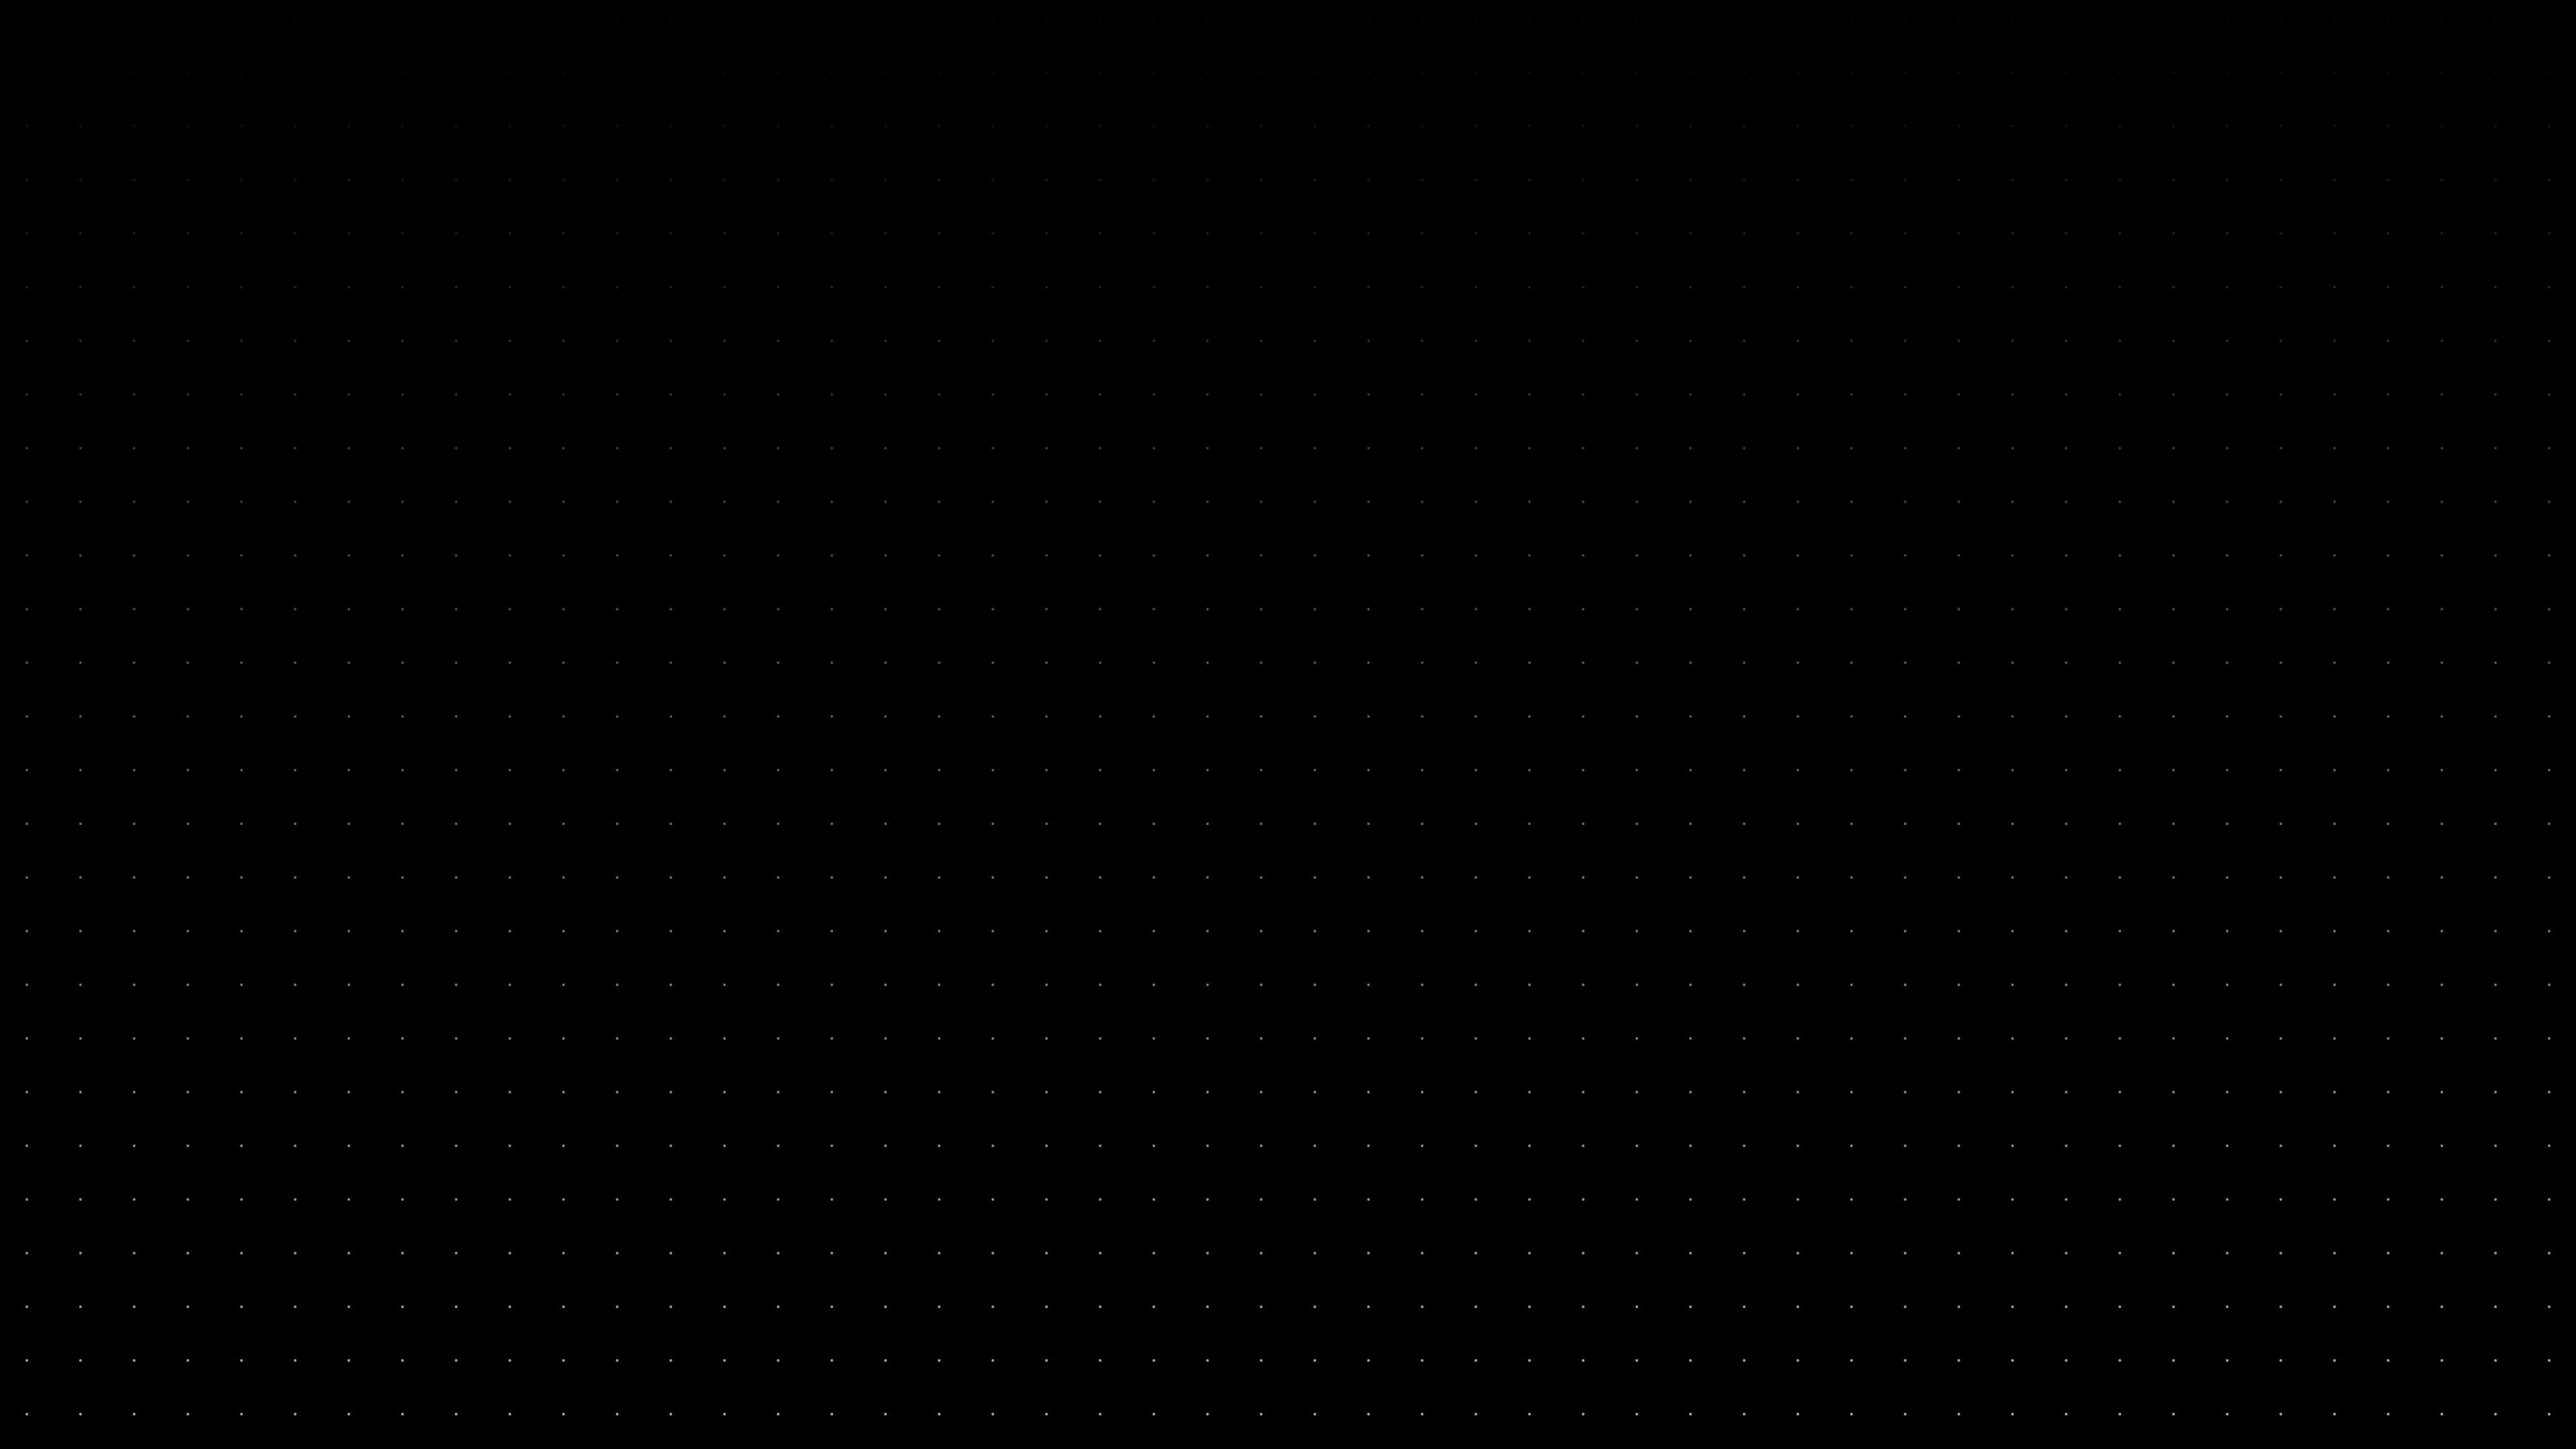 3840x2160 Dots Dark 4k 4k HD 4k Wallpapers, Images ...